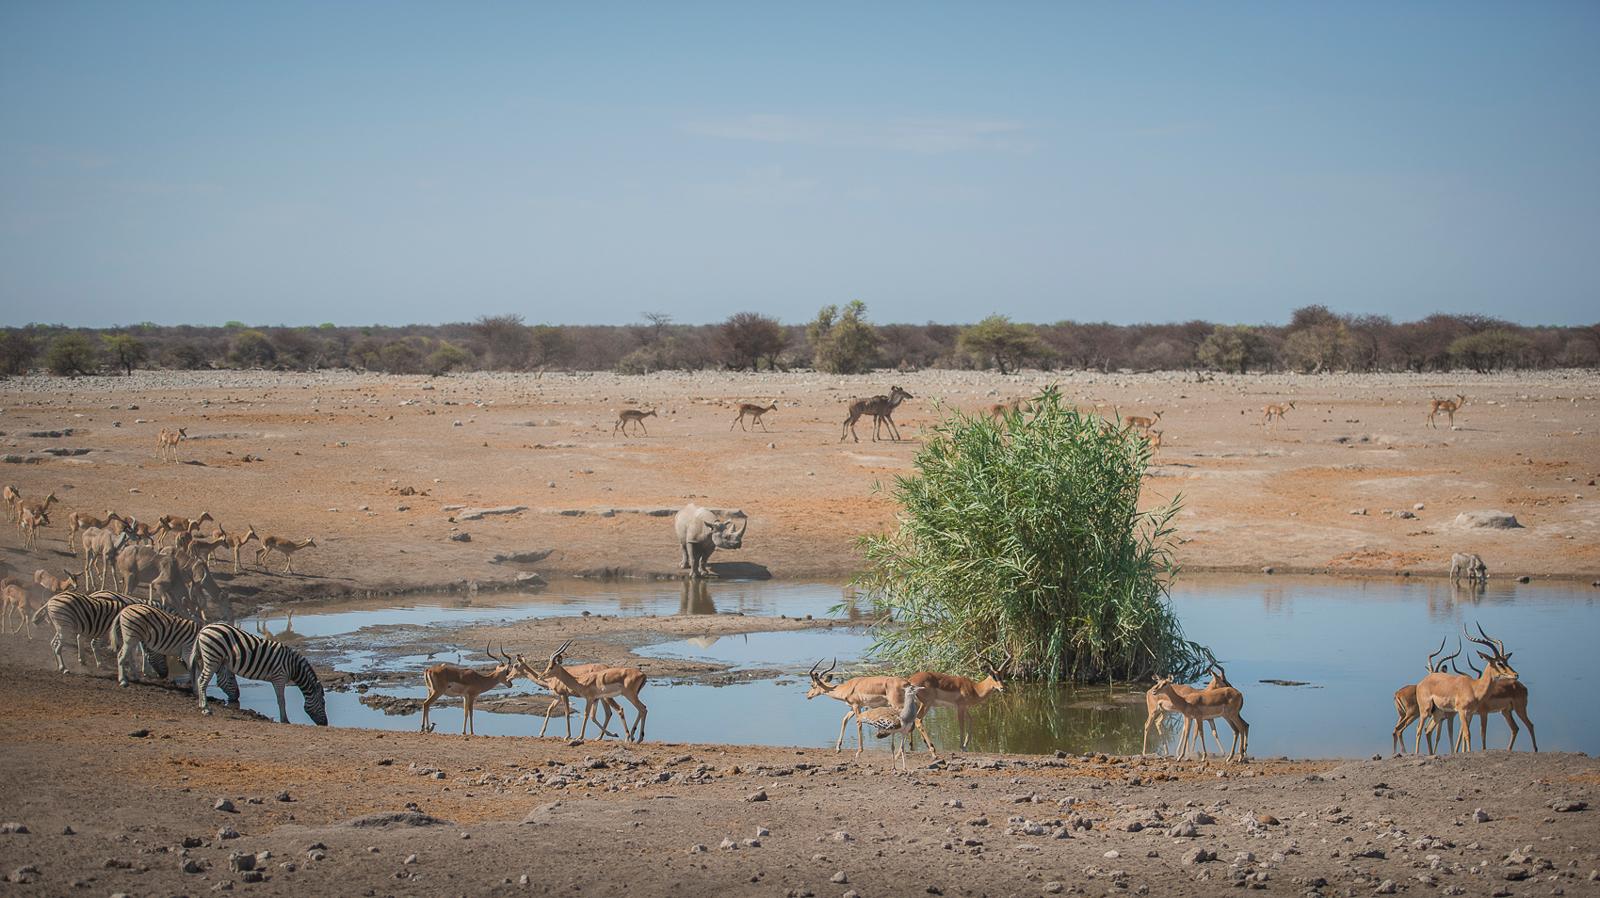 Life at the life-giving Chudop waterhole ©Anja Denker